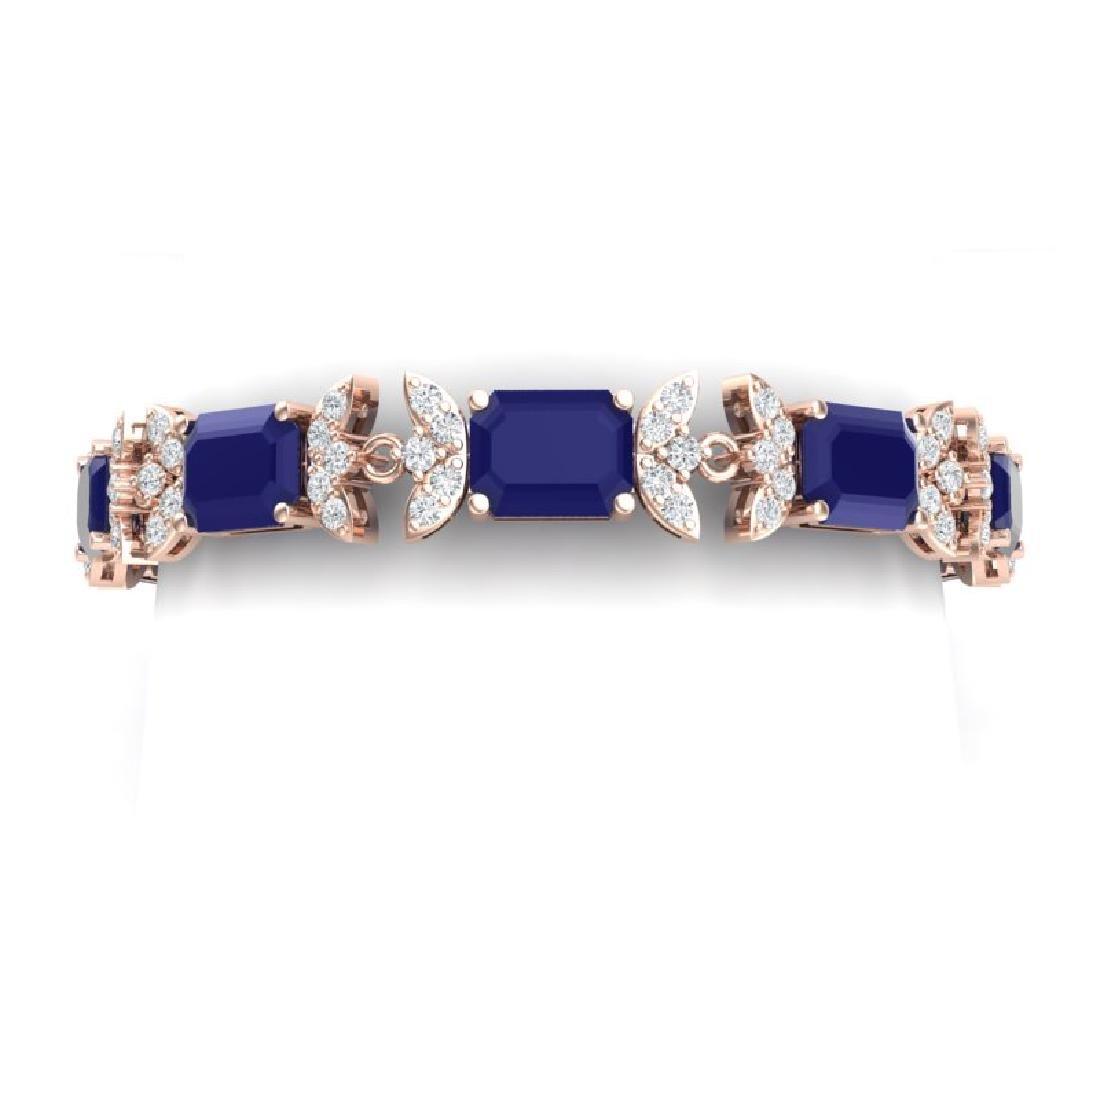 38.13 CTW Royalty Sapphire & VS Diamond Bracelet 18K